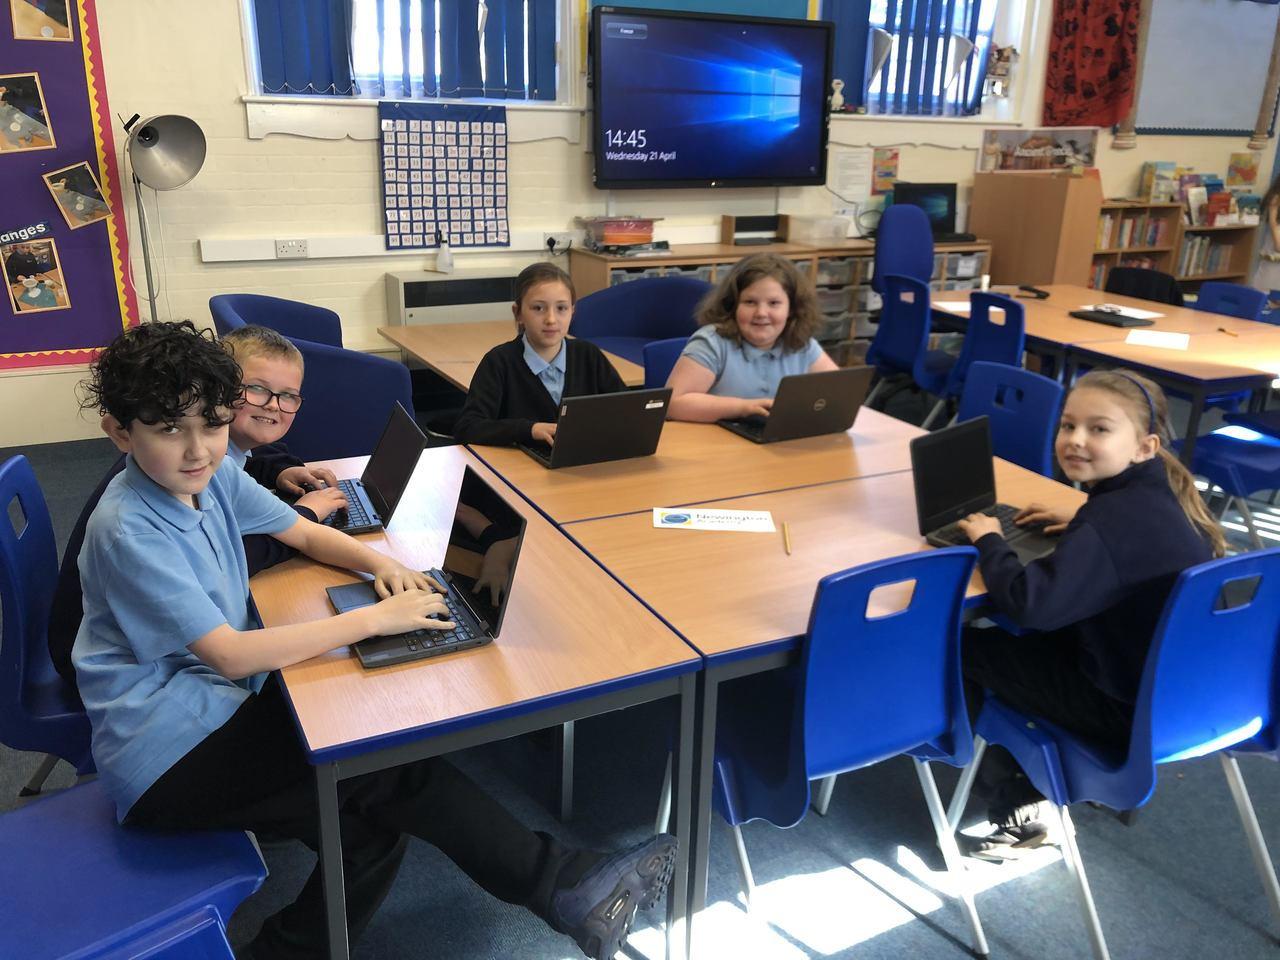 School laptops donation | Asda Hessle